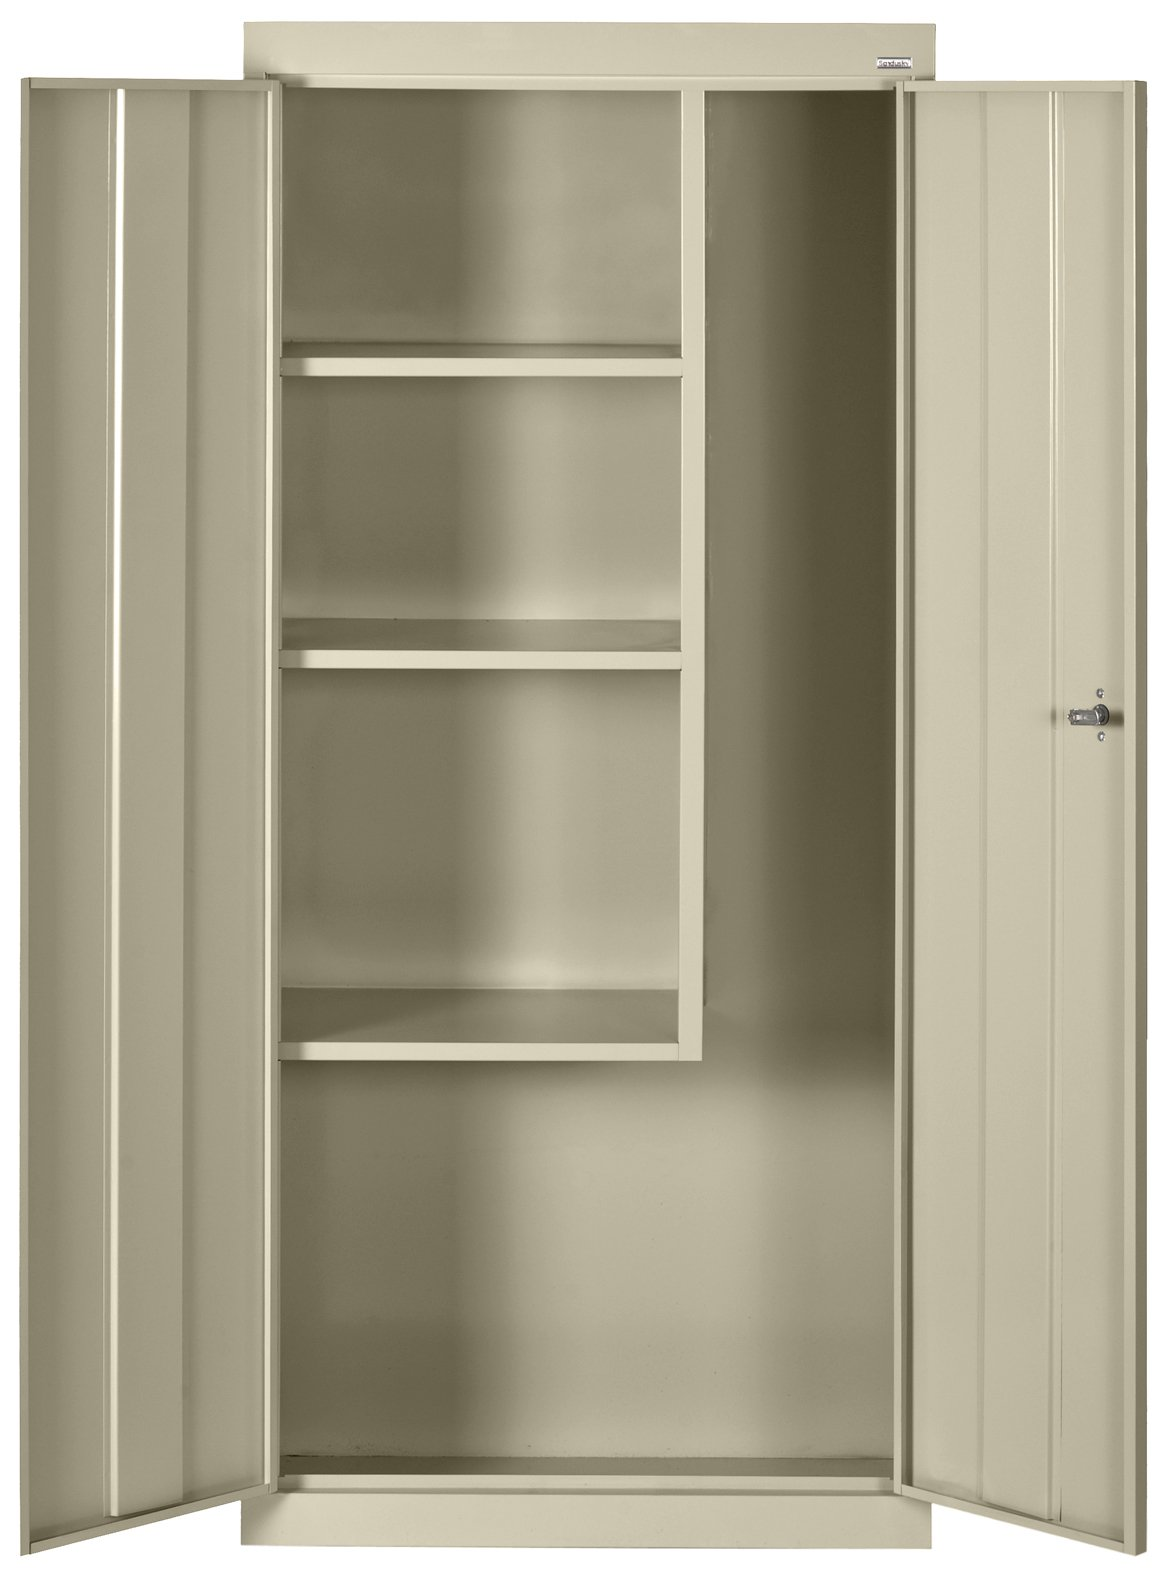 Sandusky Lee VFC1301566-07 Putty Steel Janitorial/Supply Cabinet, 3 Shelves, Cam Locking System, Powder Coat Finish, 66'' Height x 30'' Width x 15'' Depth